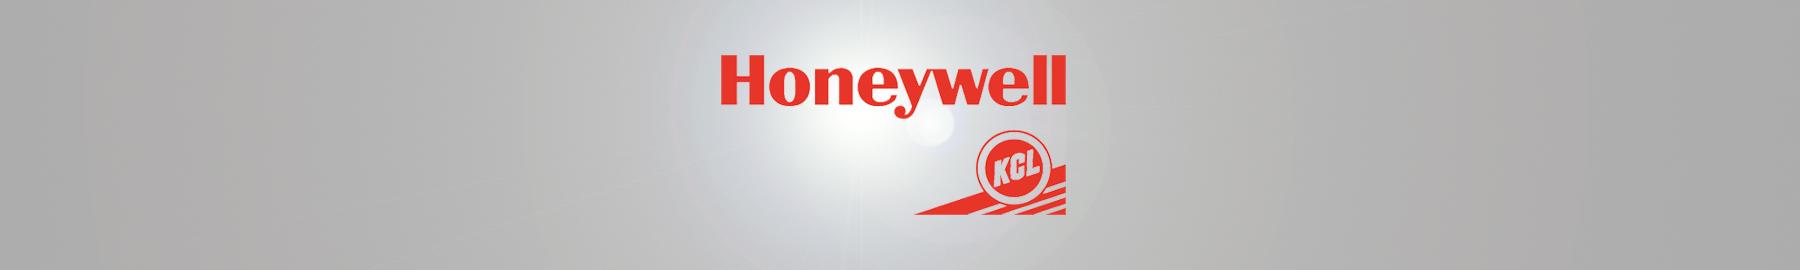 Honeywell KCL